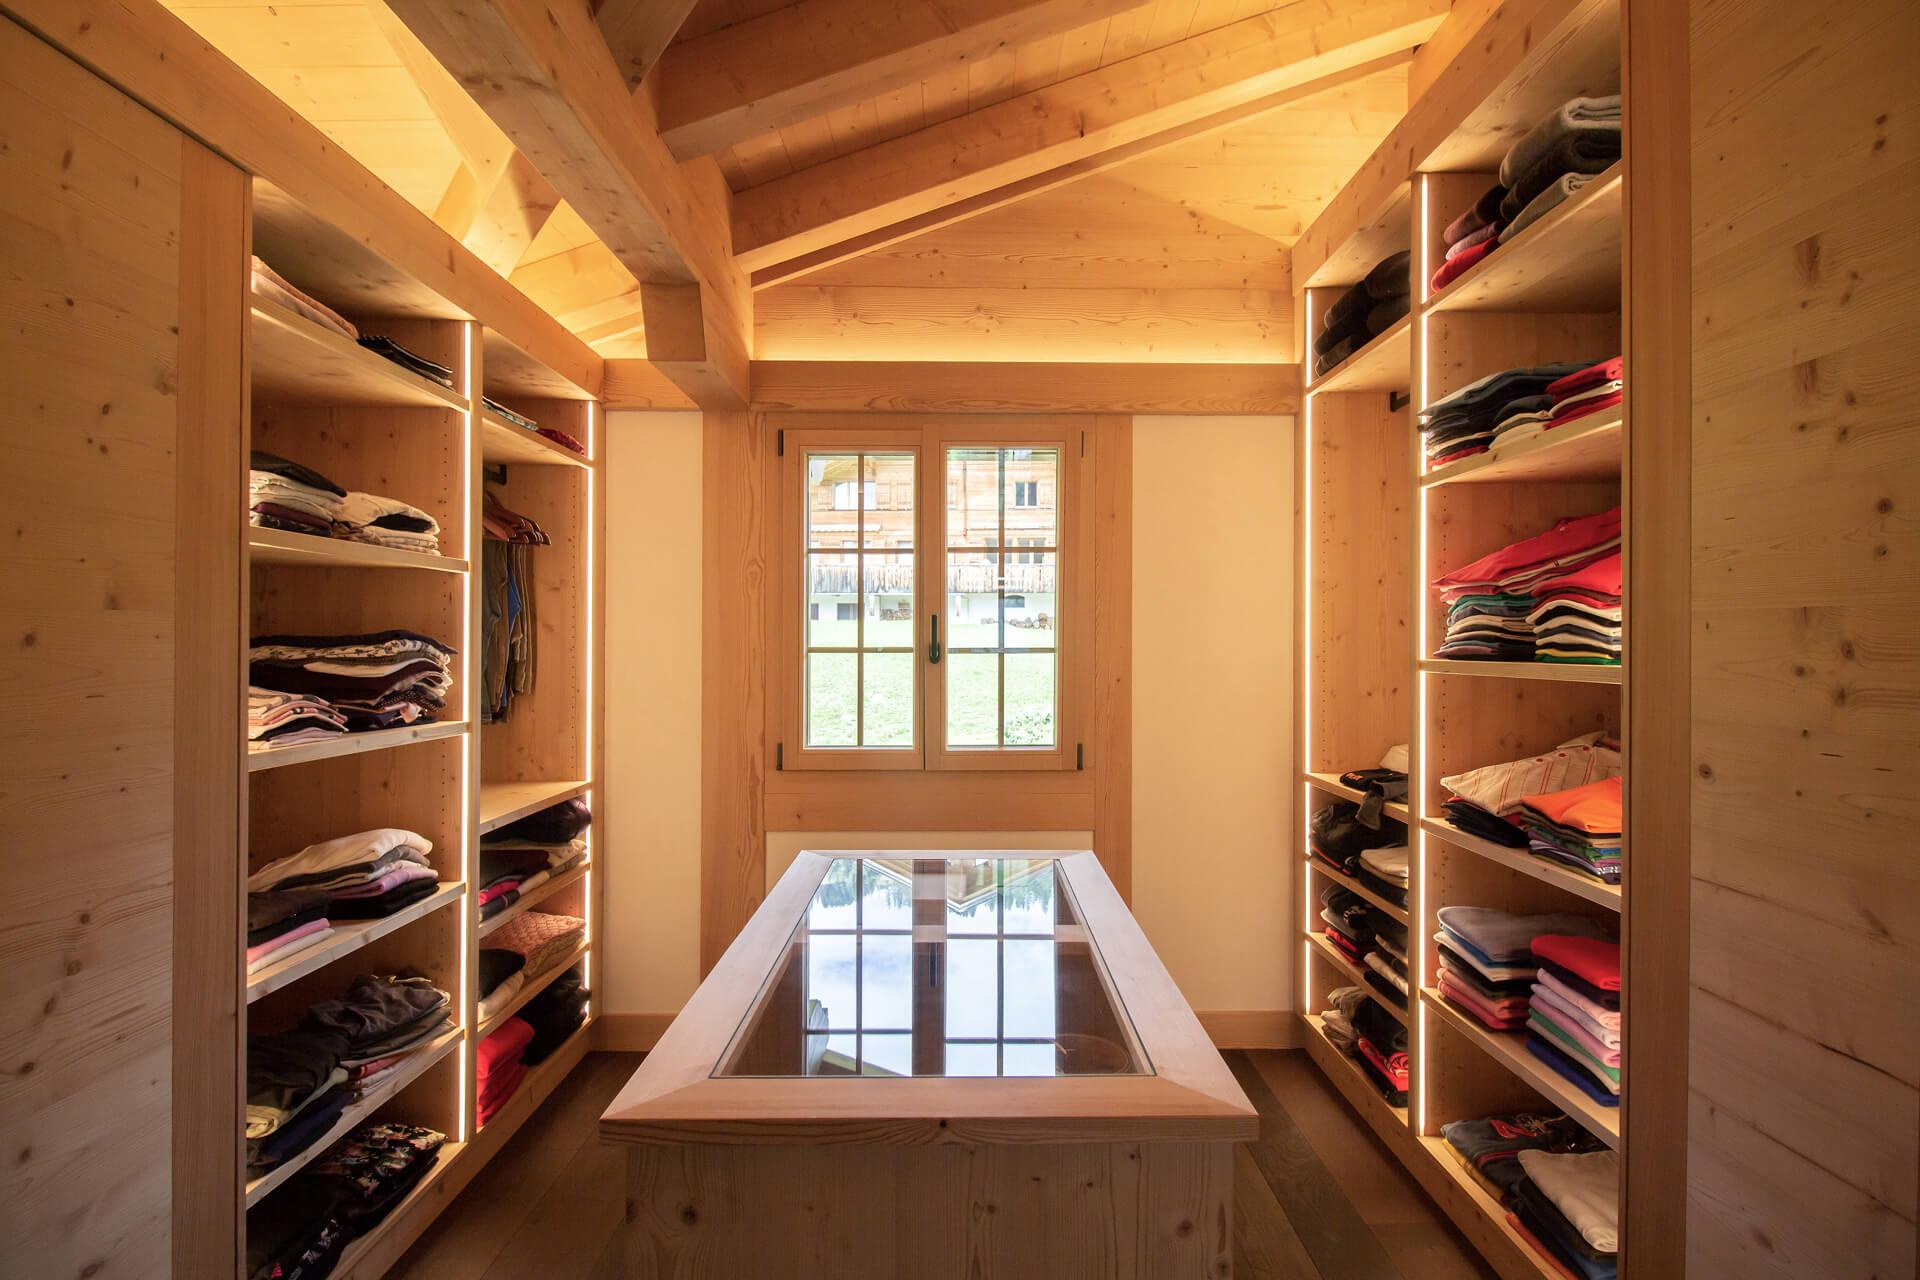 https://fsw-kreatektur.ch/wp-content/uploads/Fsw-Kreatektur-Architektur-Neubau-Schoenried-Ankleidezimmer-tiny.jpg